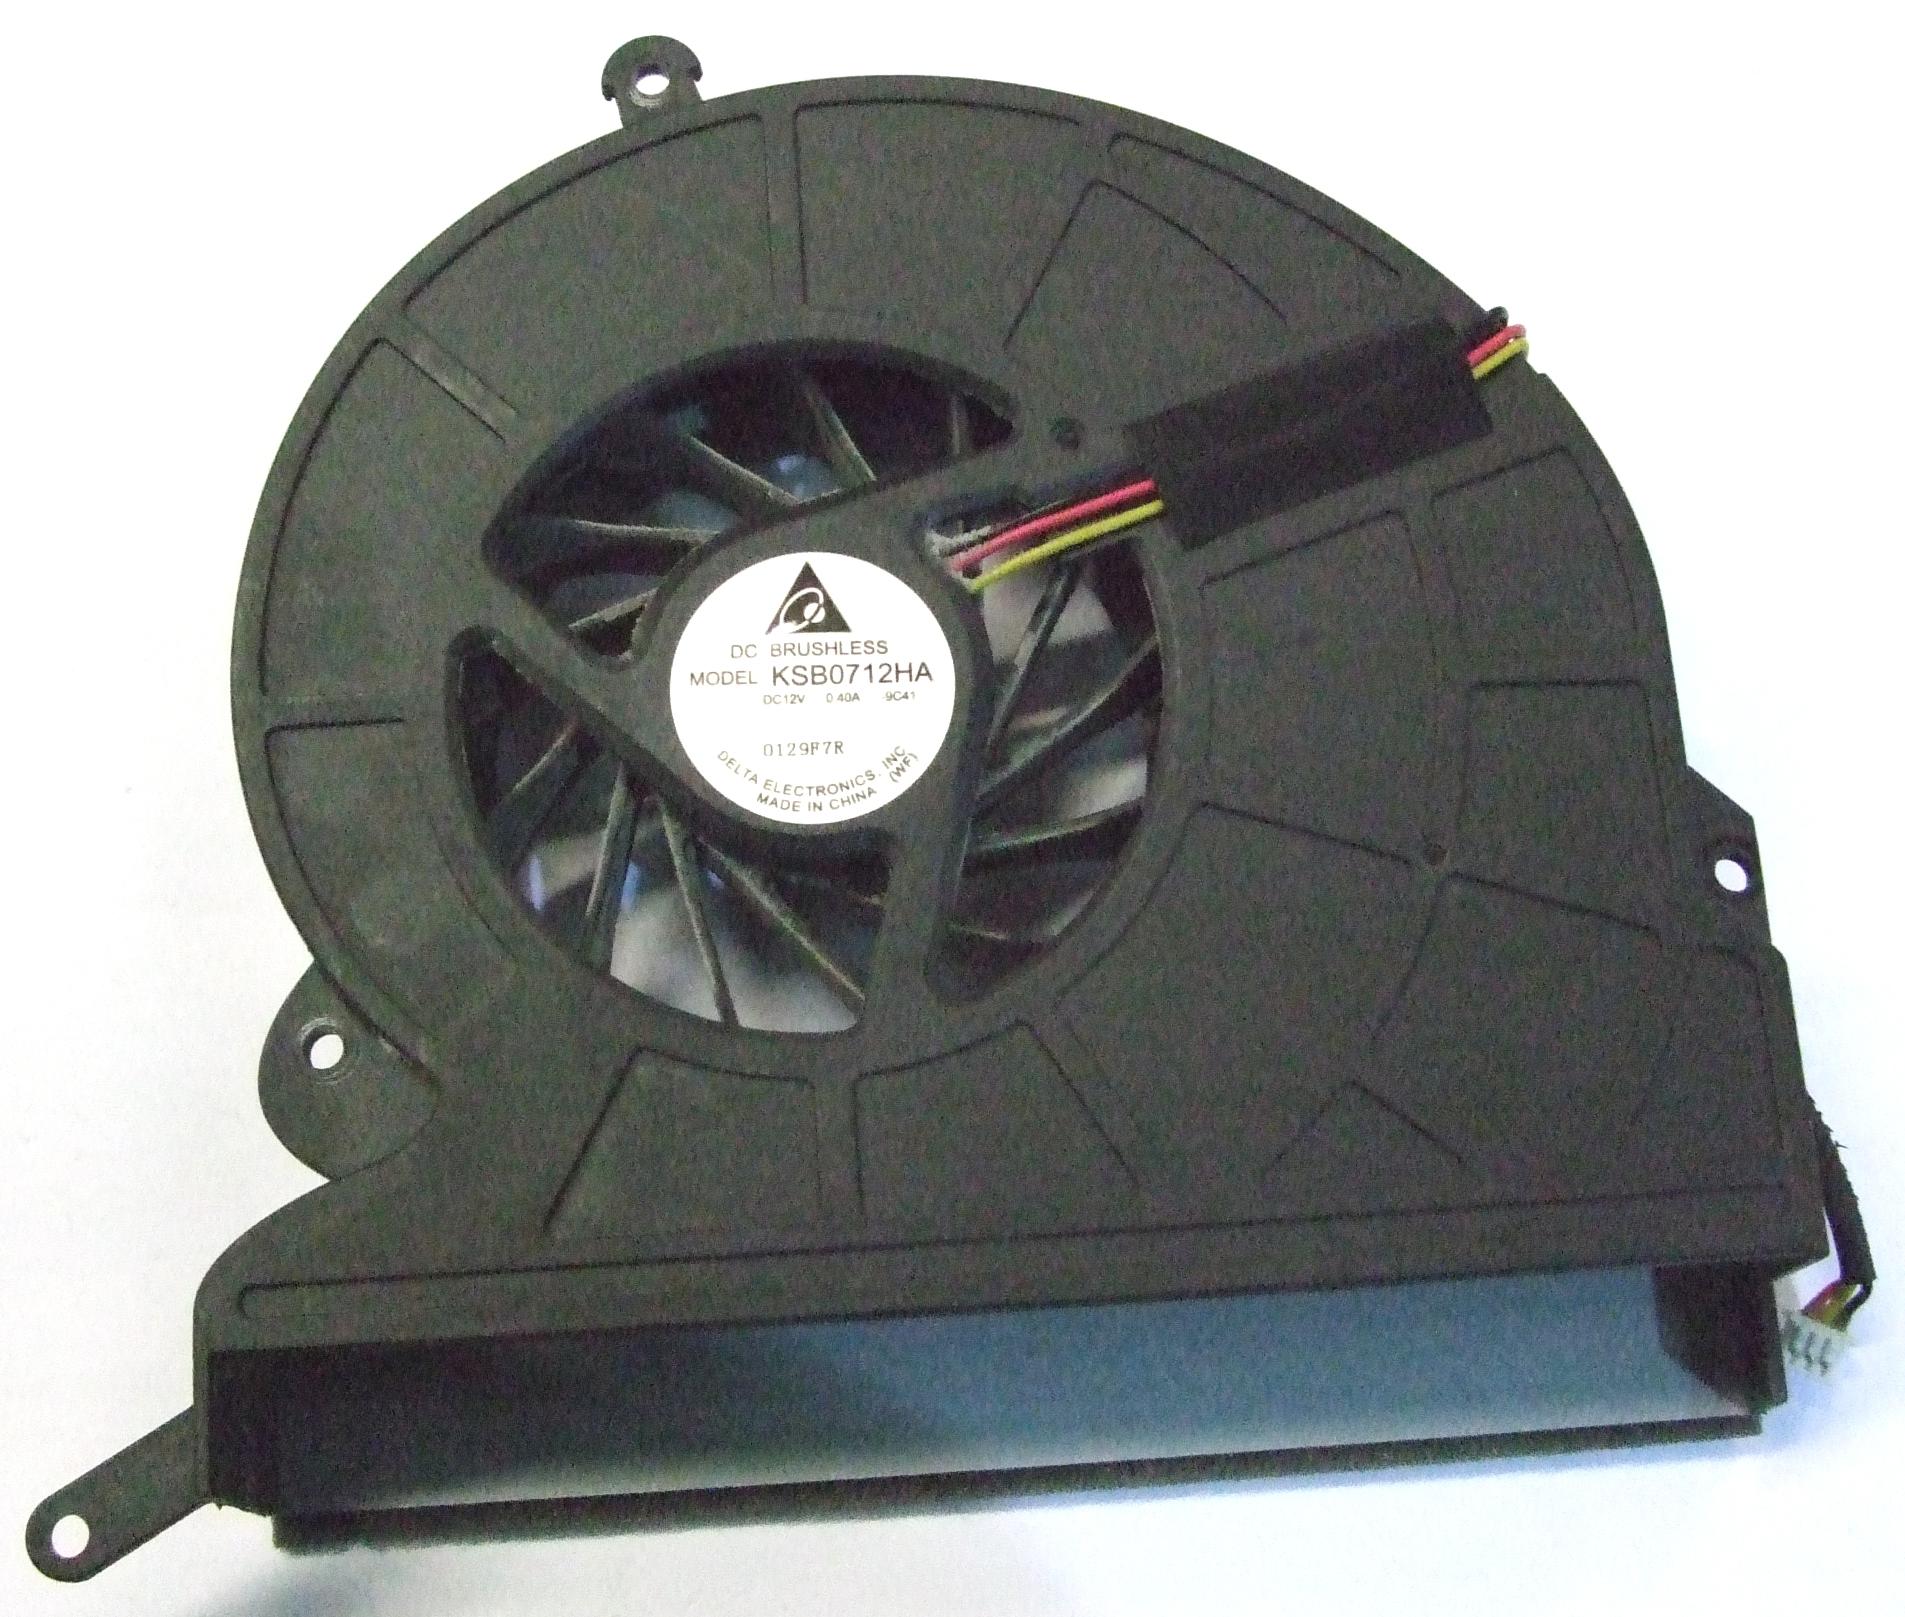 Dc Brushless Fan Replacement : Ksb ha c delta dc v a brushless fan assembly